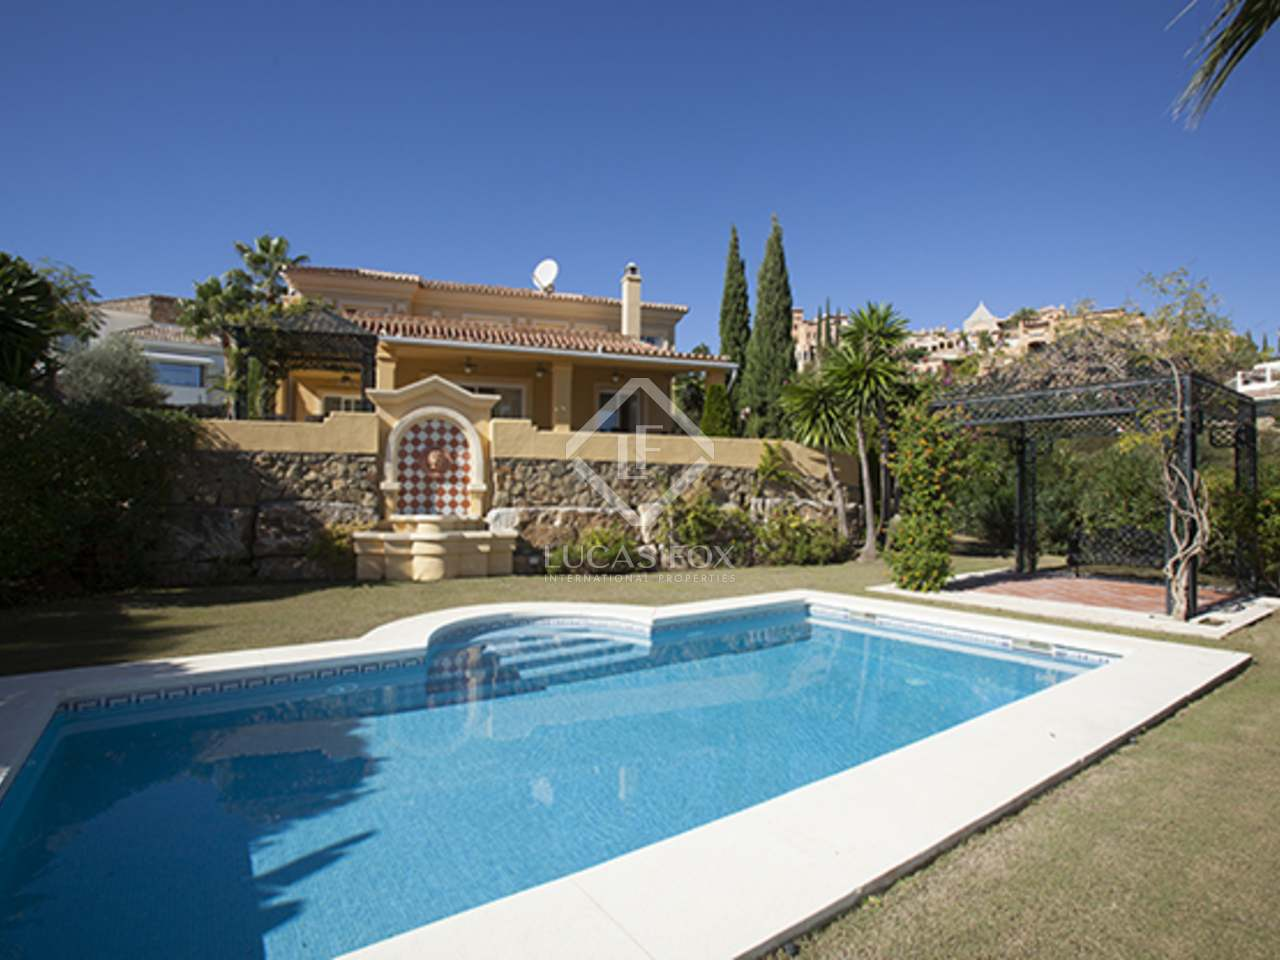 Einfamilienhaus zum Verkauf in Nueva Andaluca Marbella